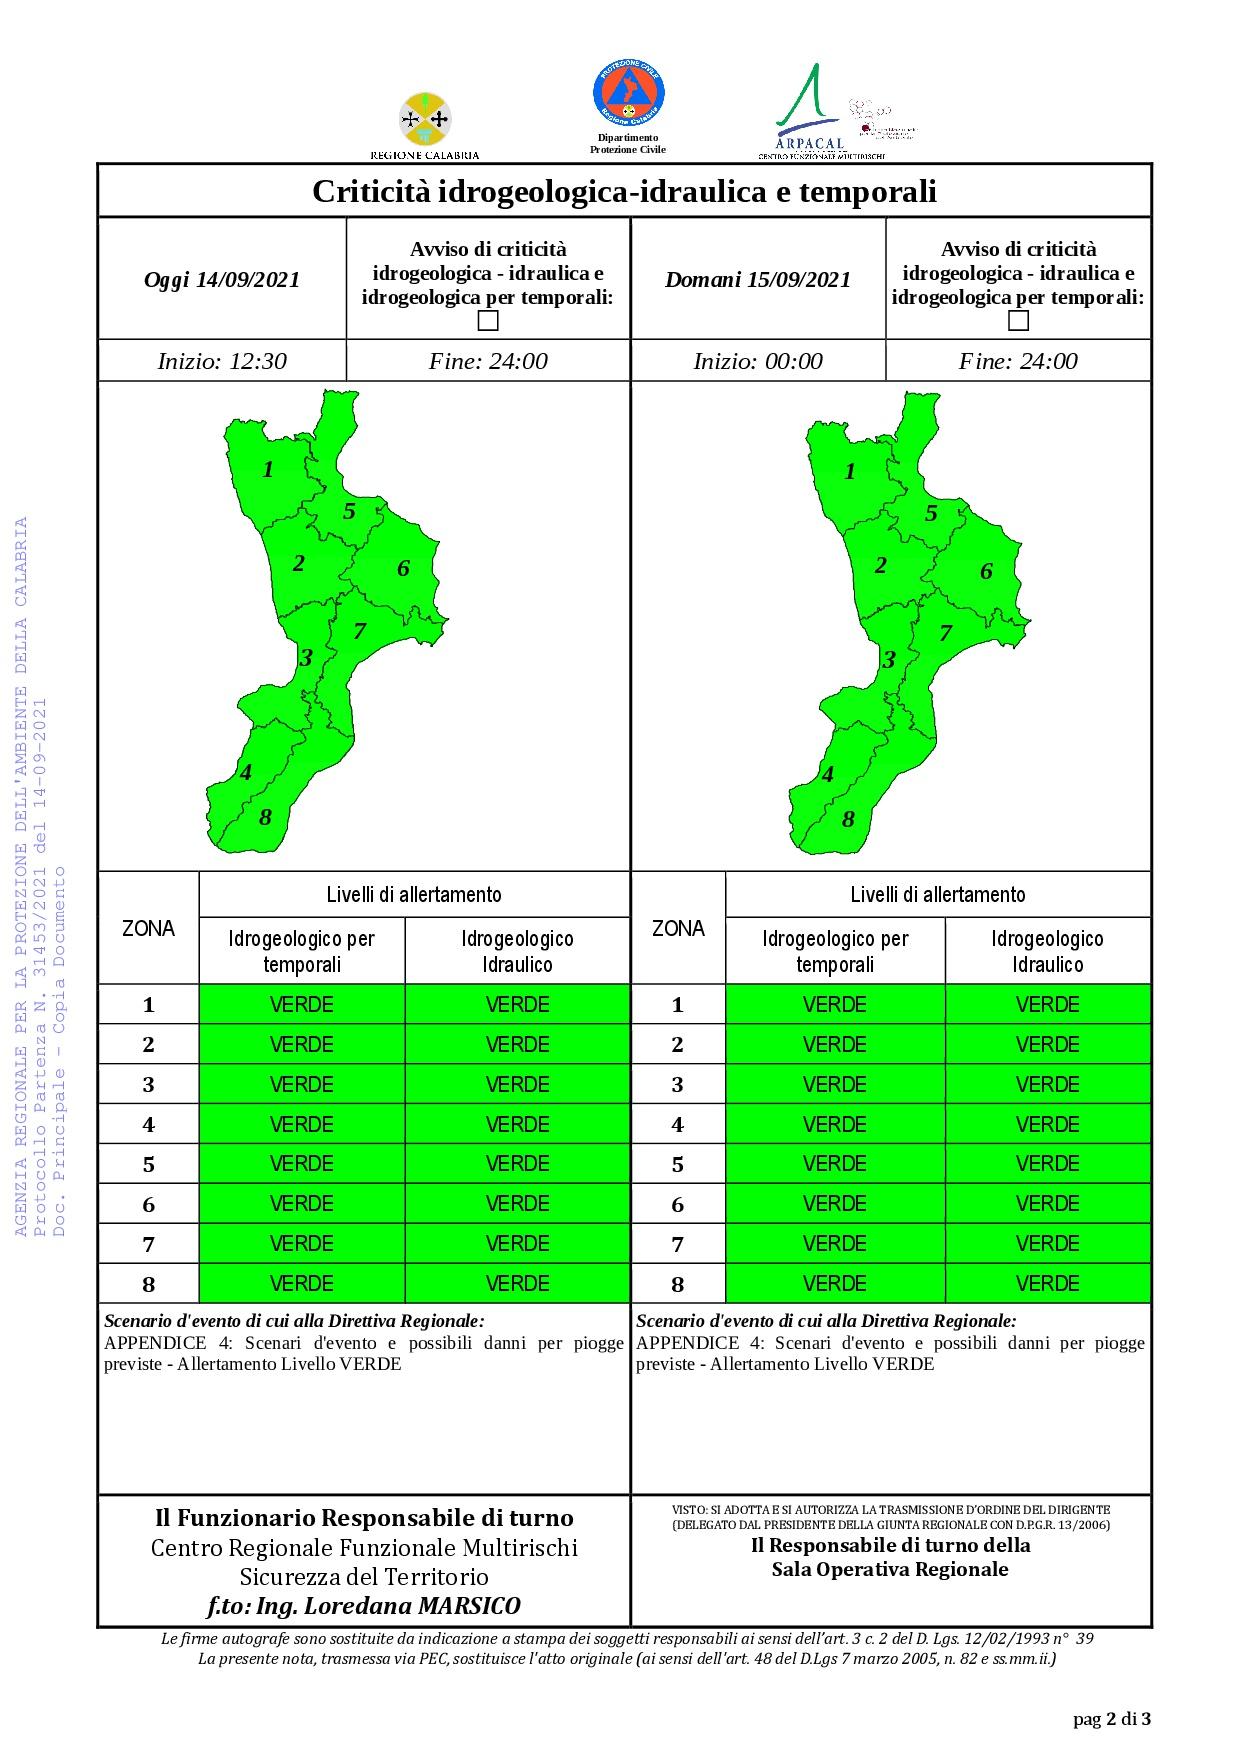 Criticità idrogeologica-idraulica e temporali in Calabria 14-09-2021